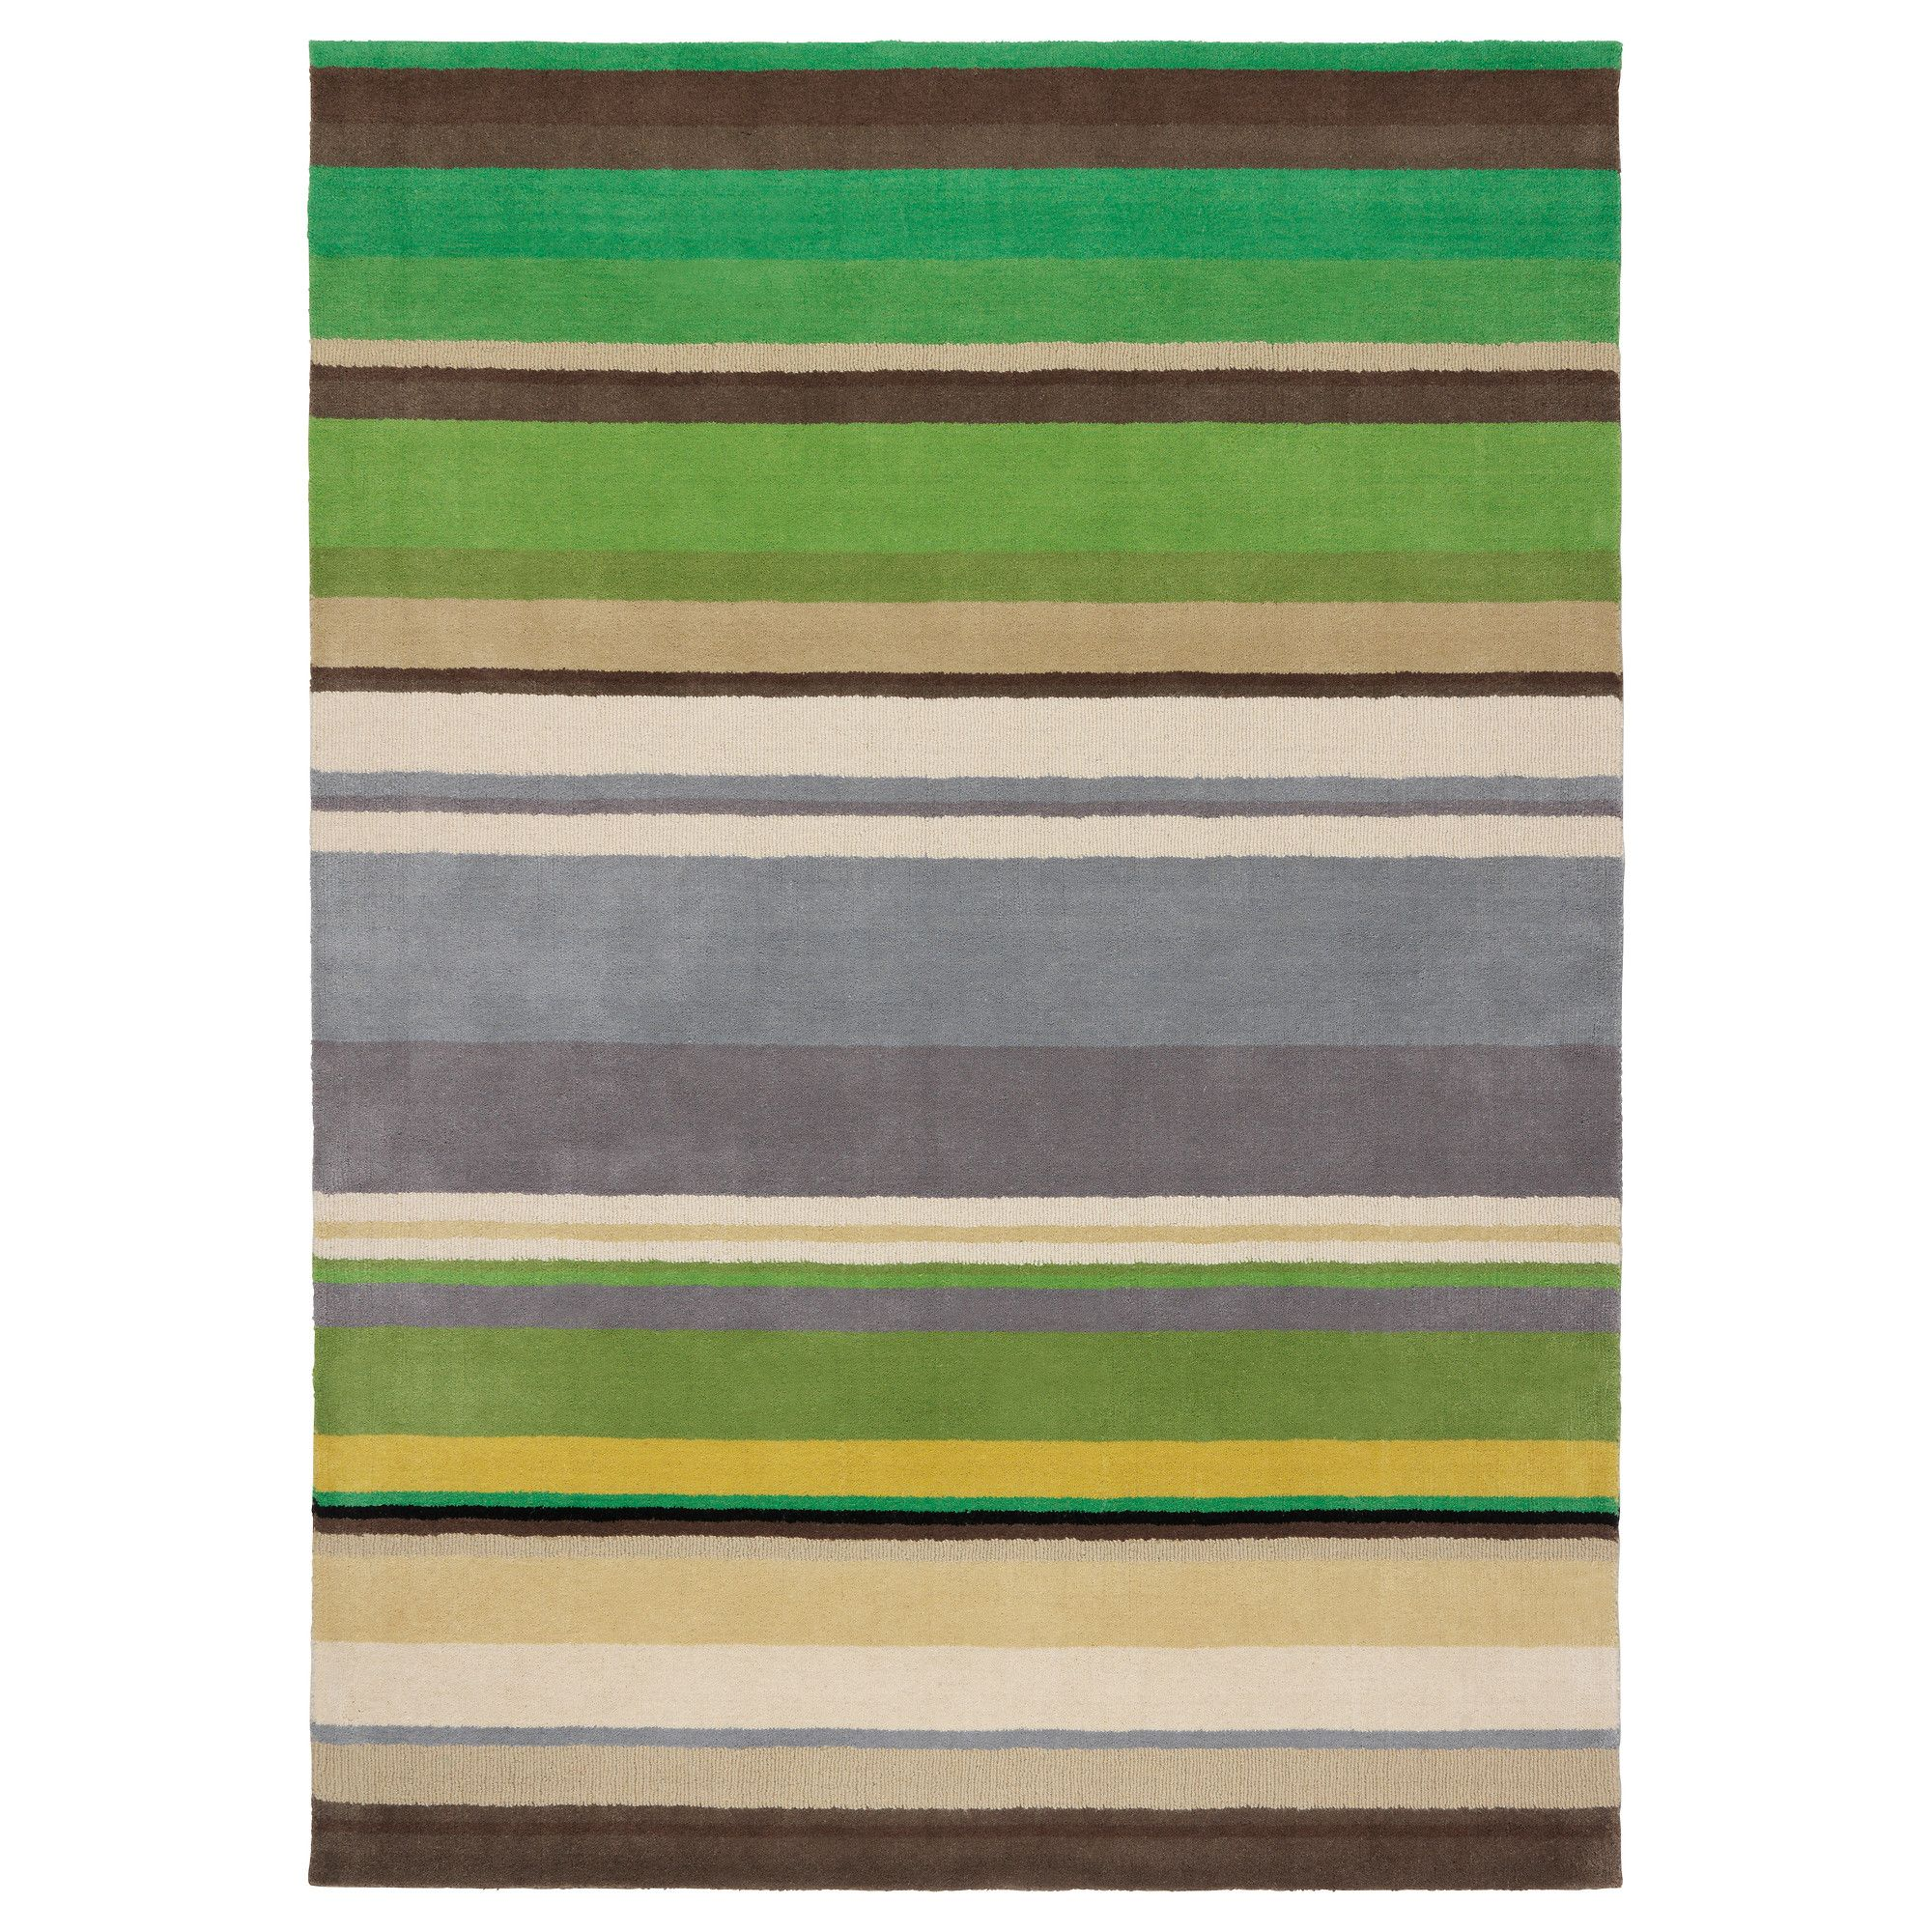 Ikea Large Rugs Usa: STOCKHOLM Rug, Low Pile, Green Handmade Green